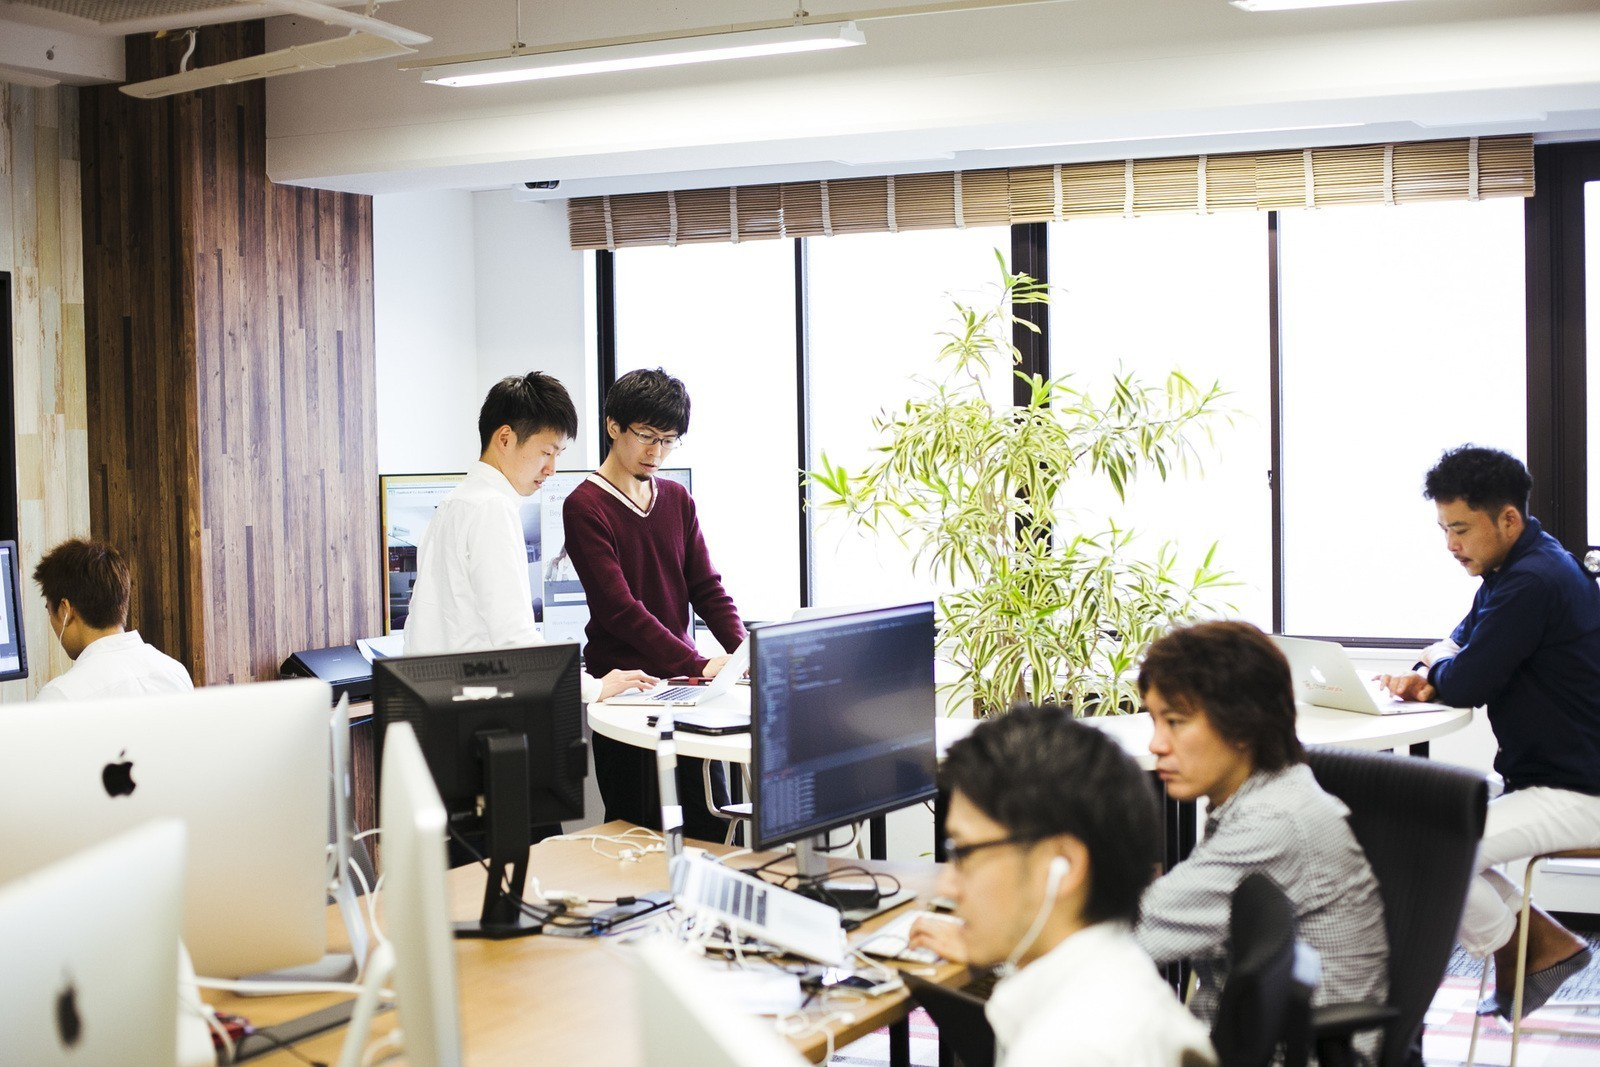 「ChatWork(チャットワーク)」でIOSリードエンジニアを募集!!【導入企業数13万社以上】【18億円資金調達完了】